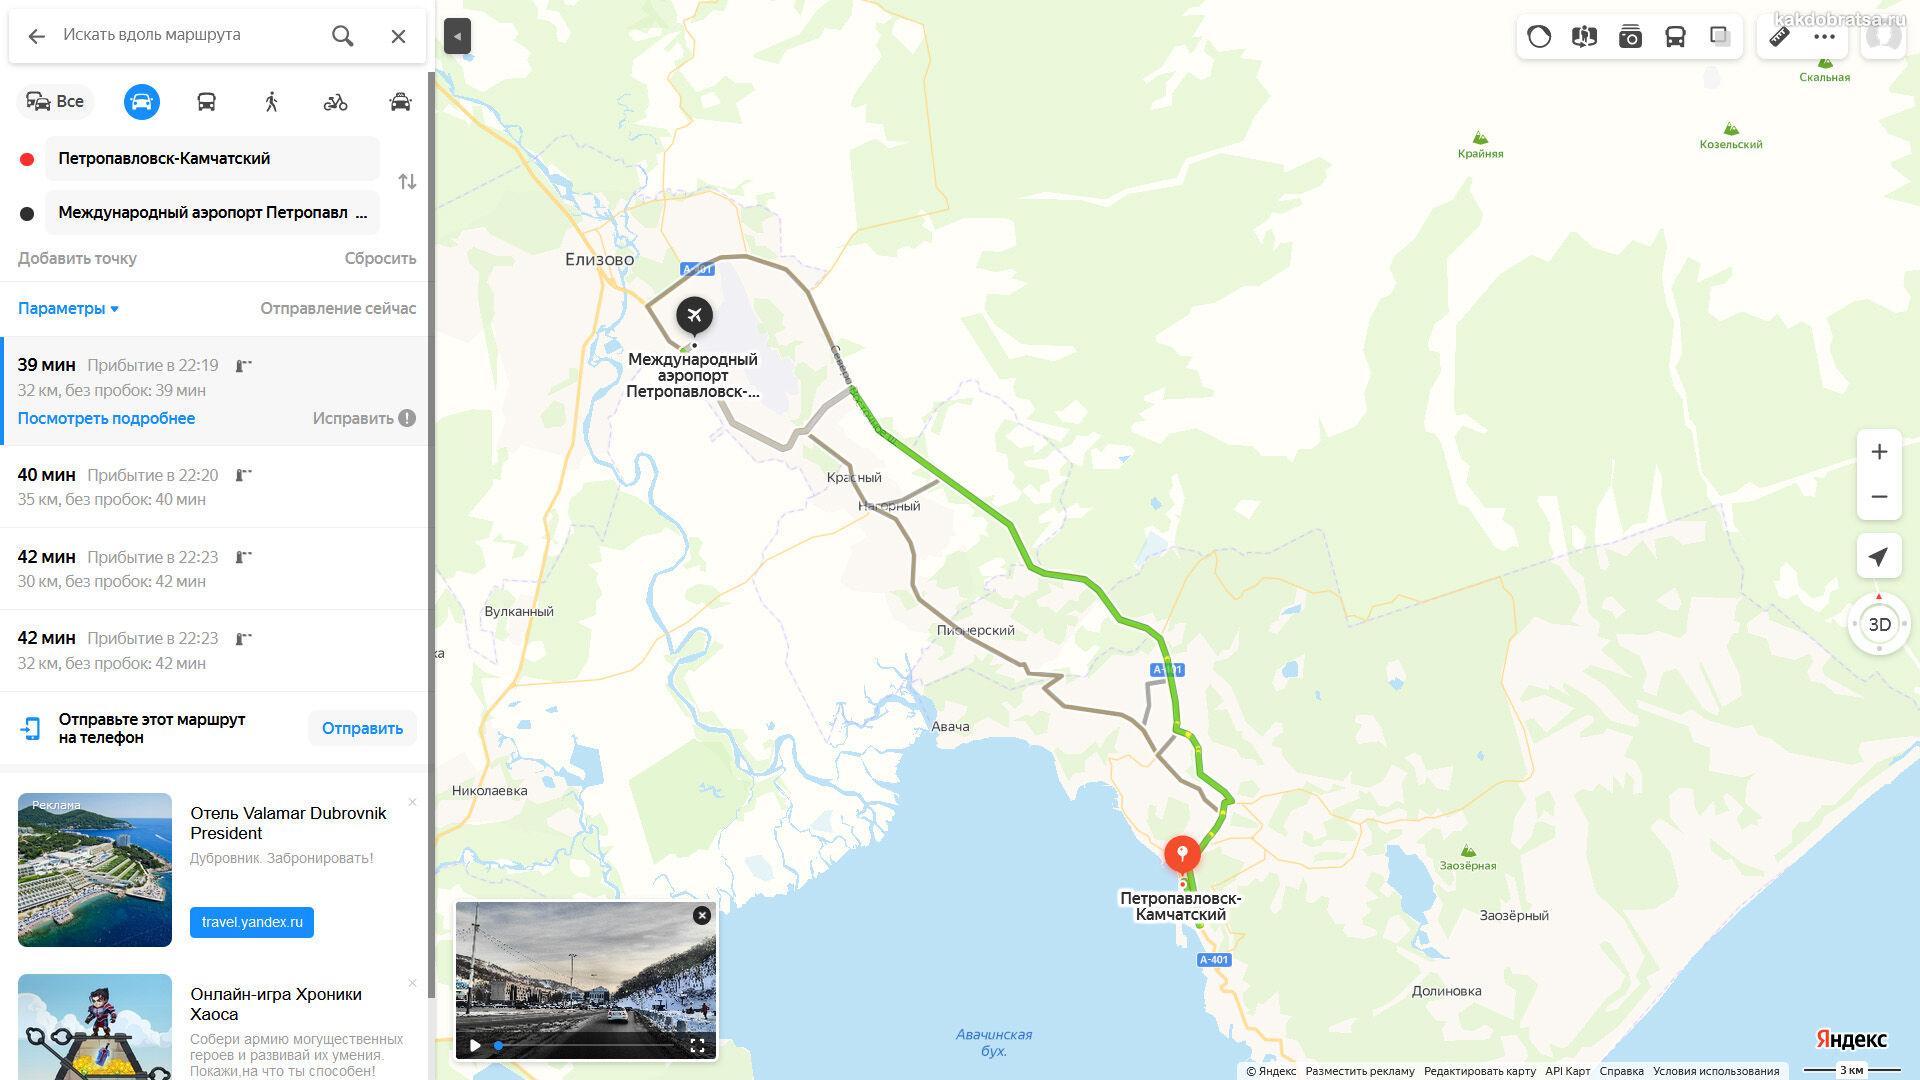 Аэропорт Елизово на Камчатке - карта